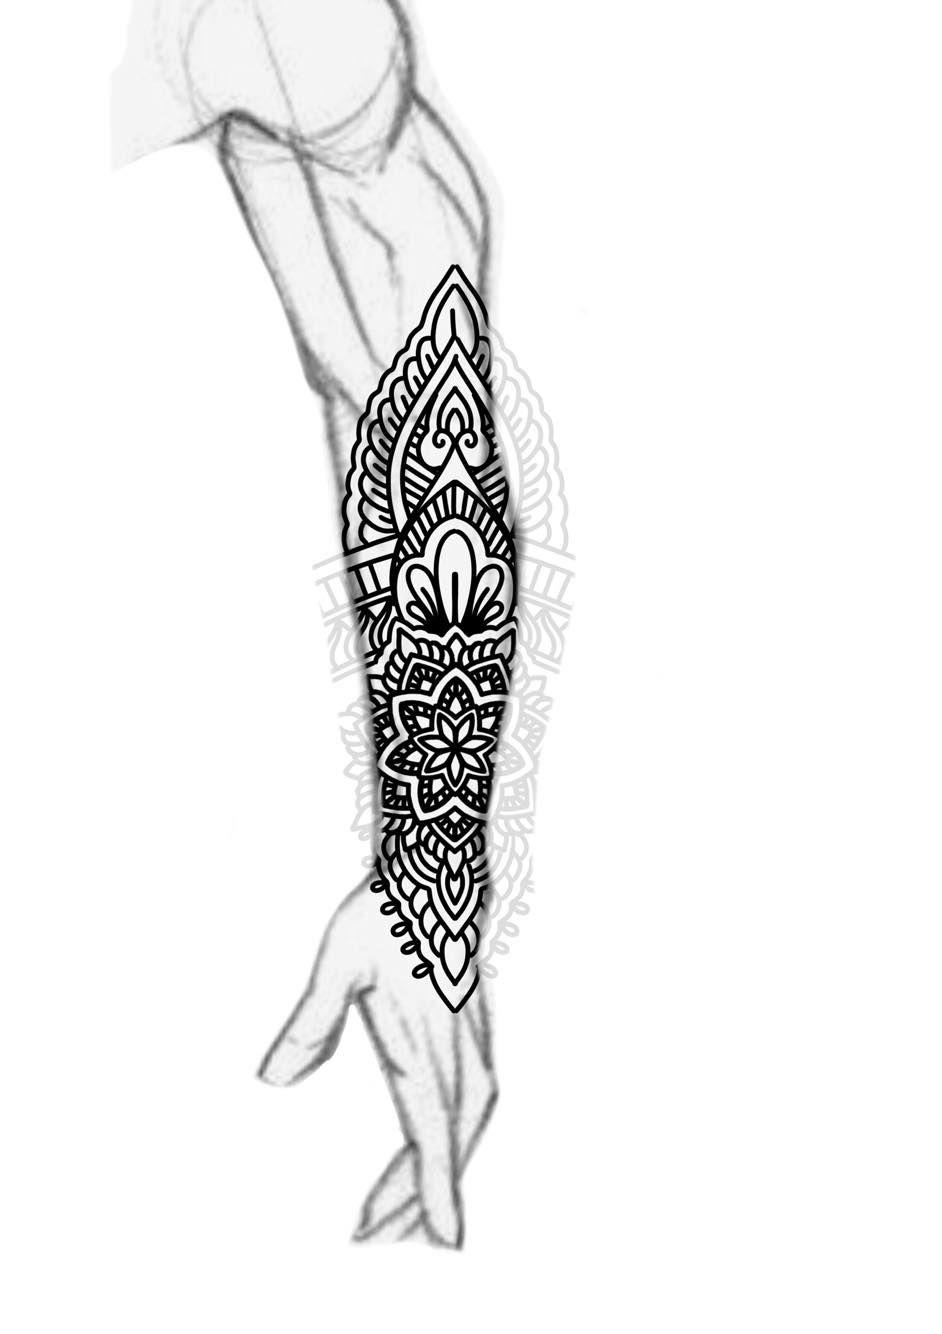 Blackwork Forearm Sleeve Mandala Ornamental Bold Lines Tattoo Design Follow Me On My Blog To Join All My Forearm Tattoos Tattoo Sleeve Designs Forearm Sleeve